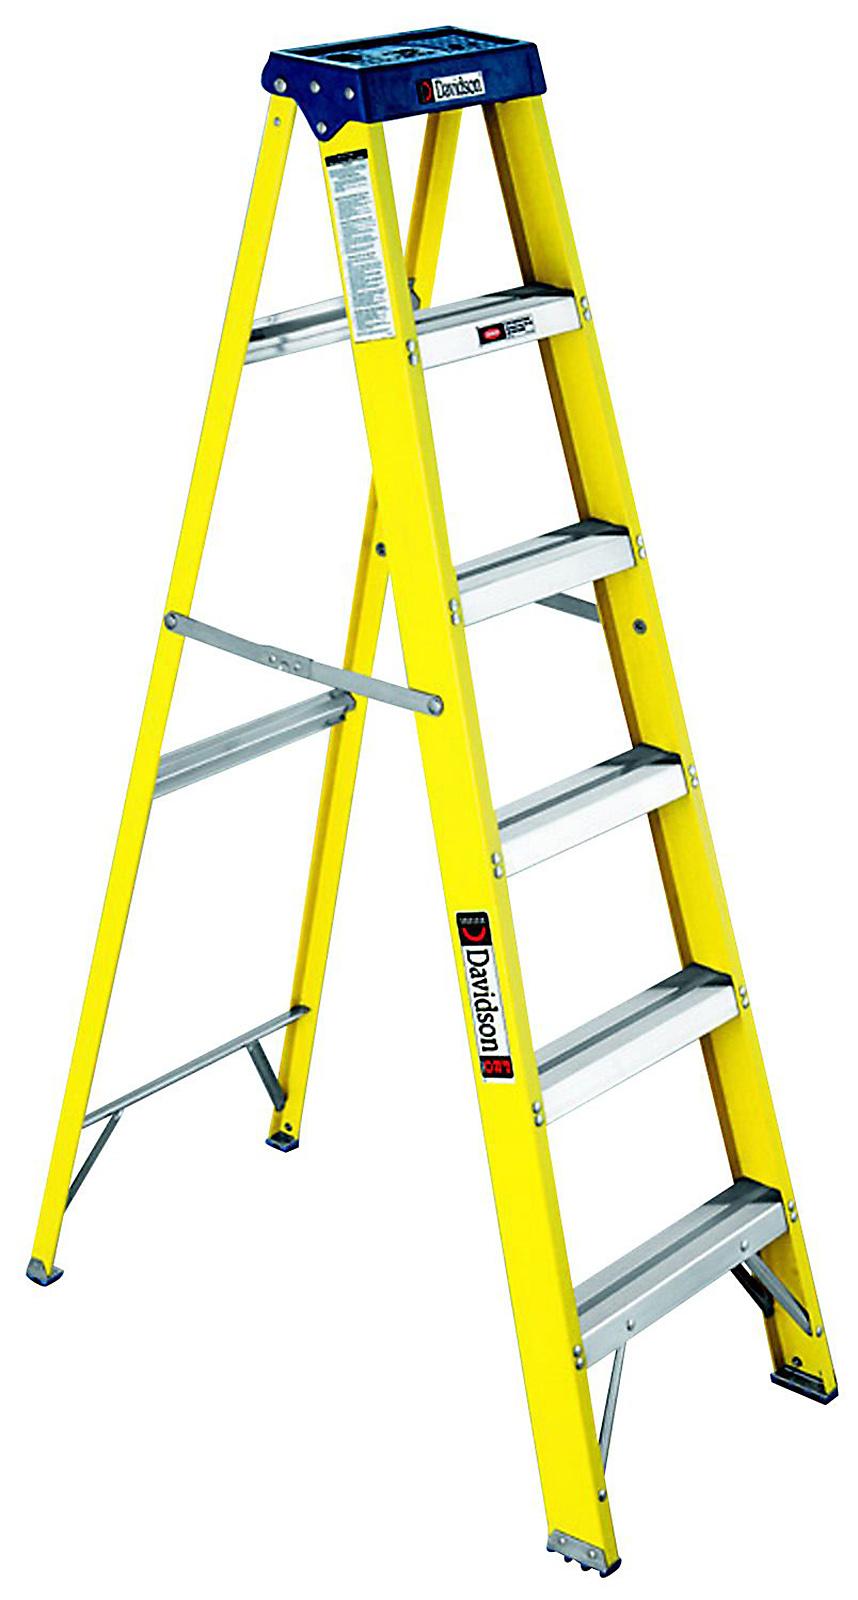 Davidson 639 Fiberglass Step Ladder Tools Garage